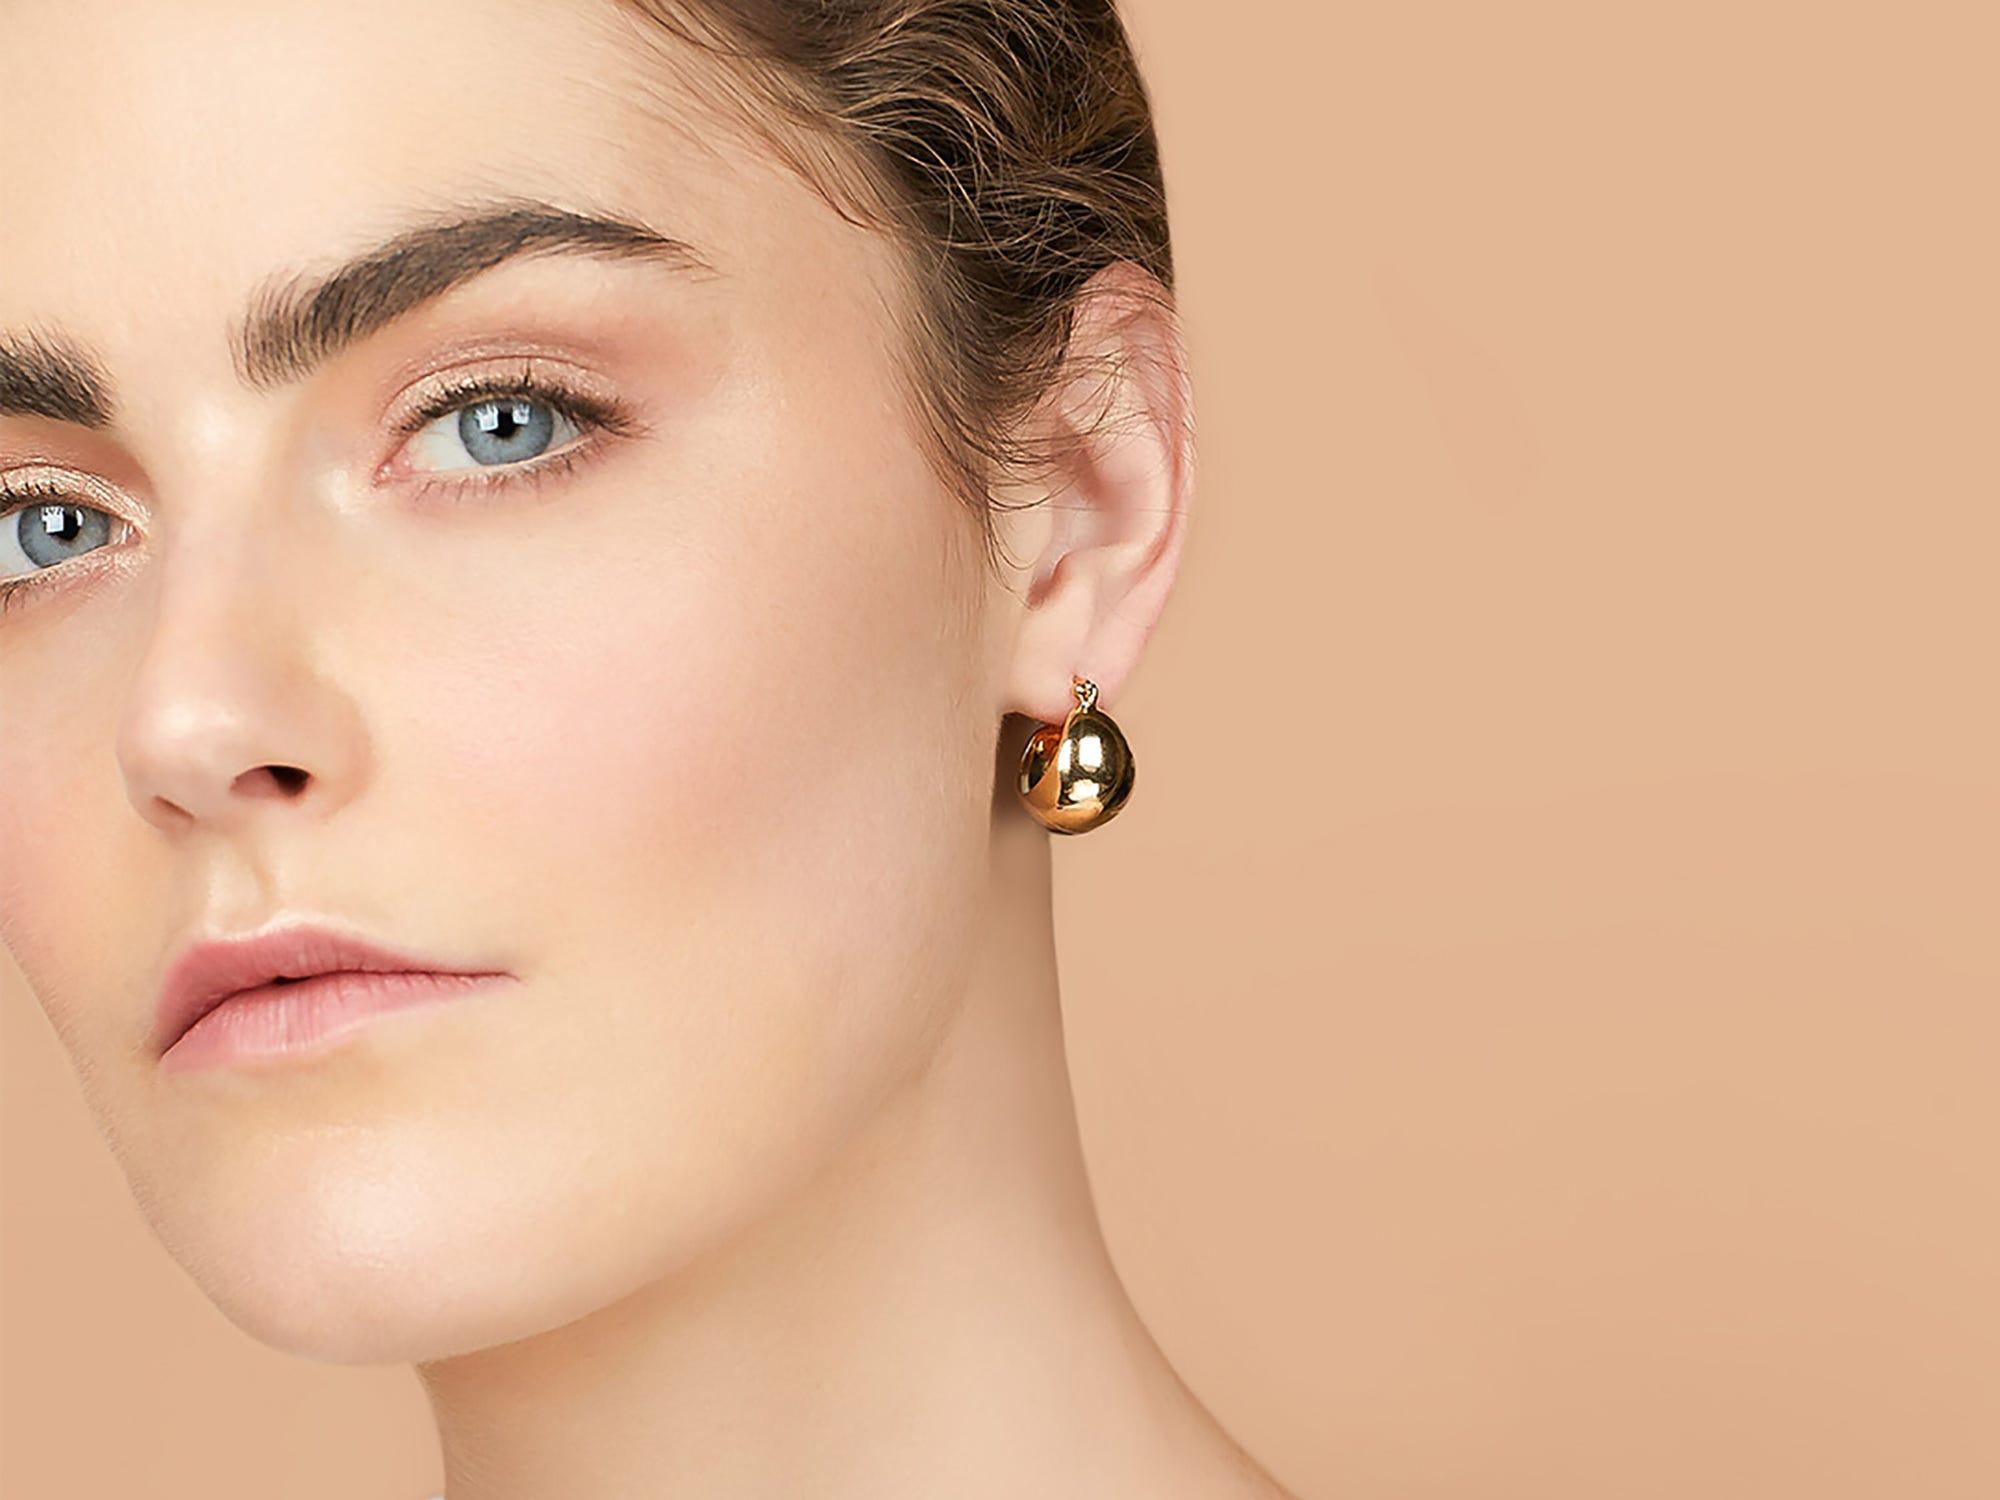 The Abby Earring